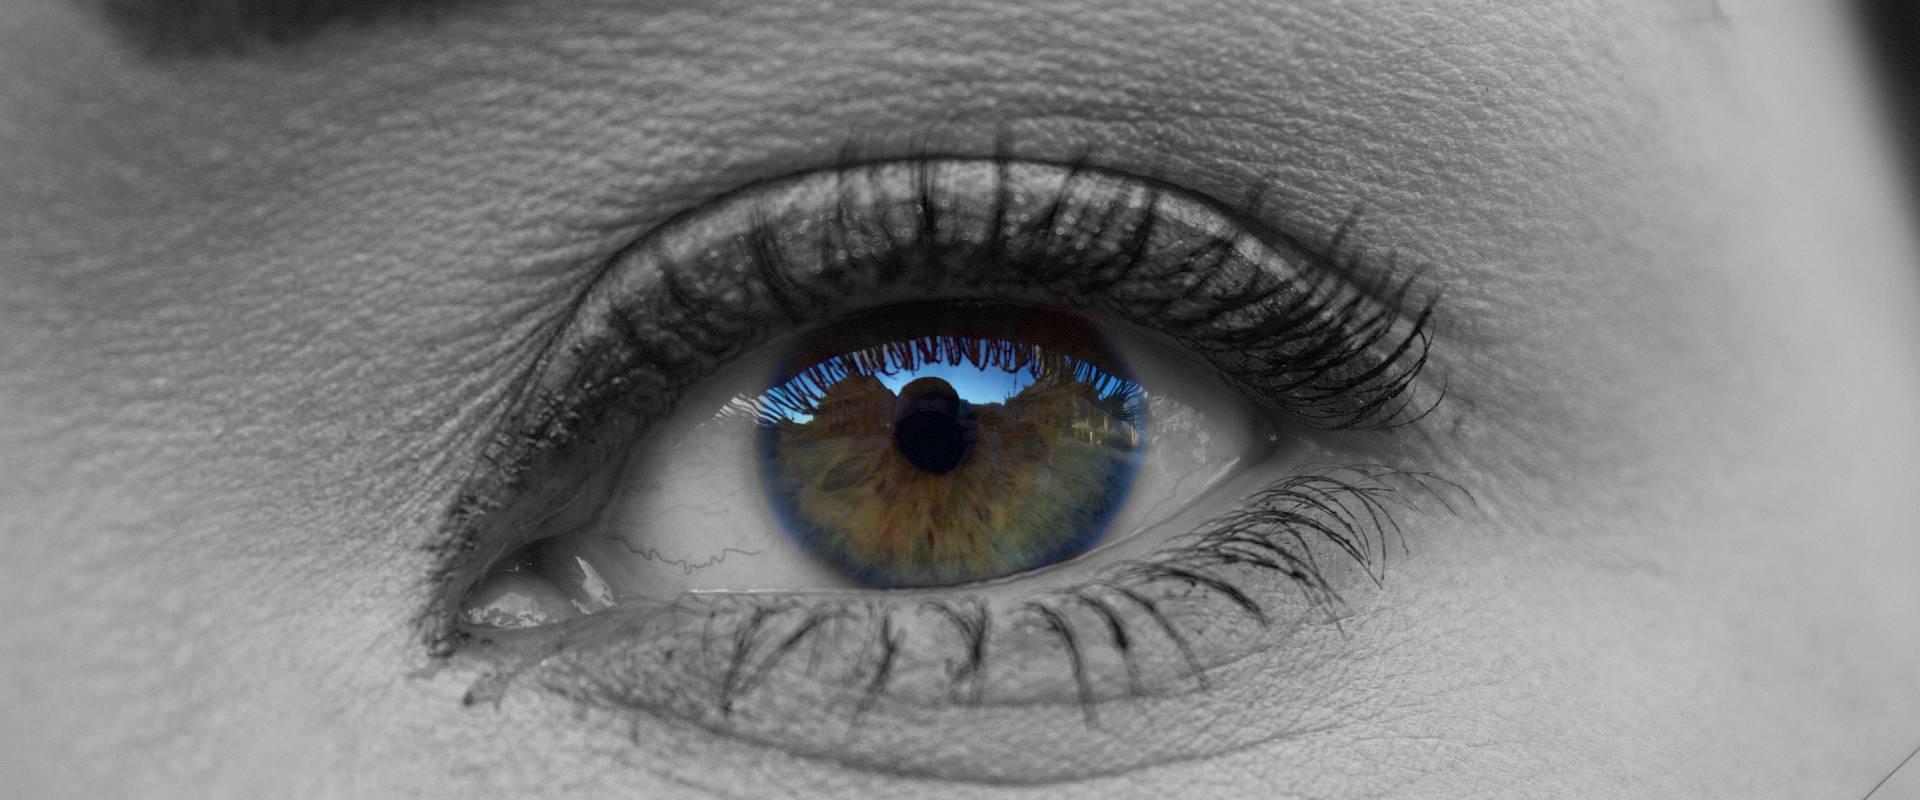 eye-grey_1920x800